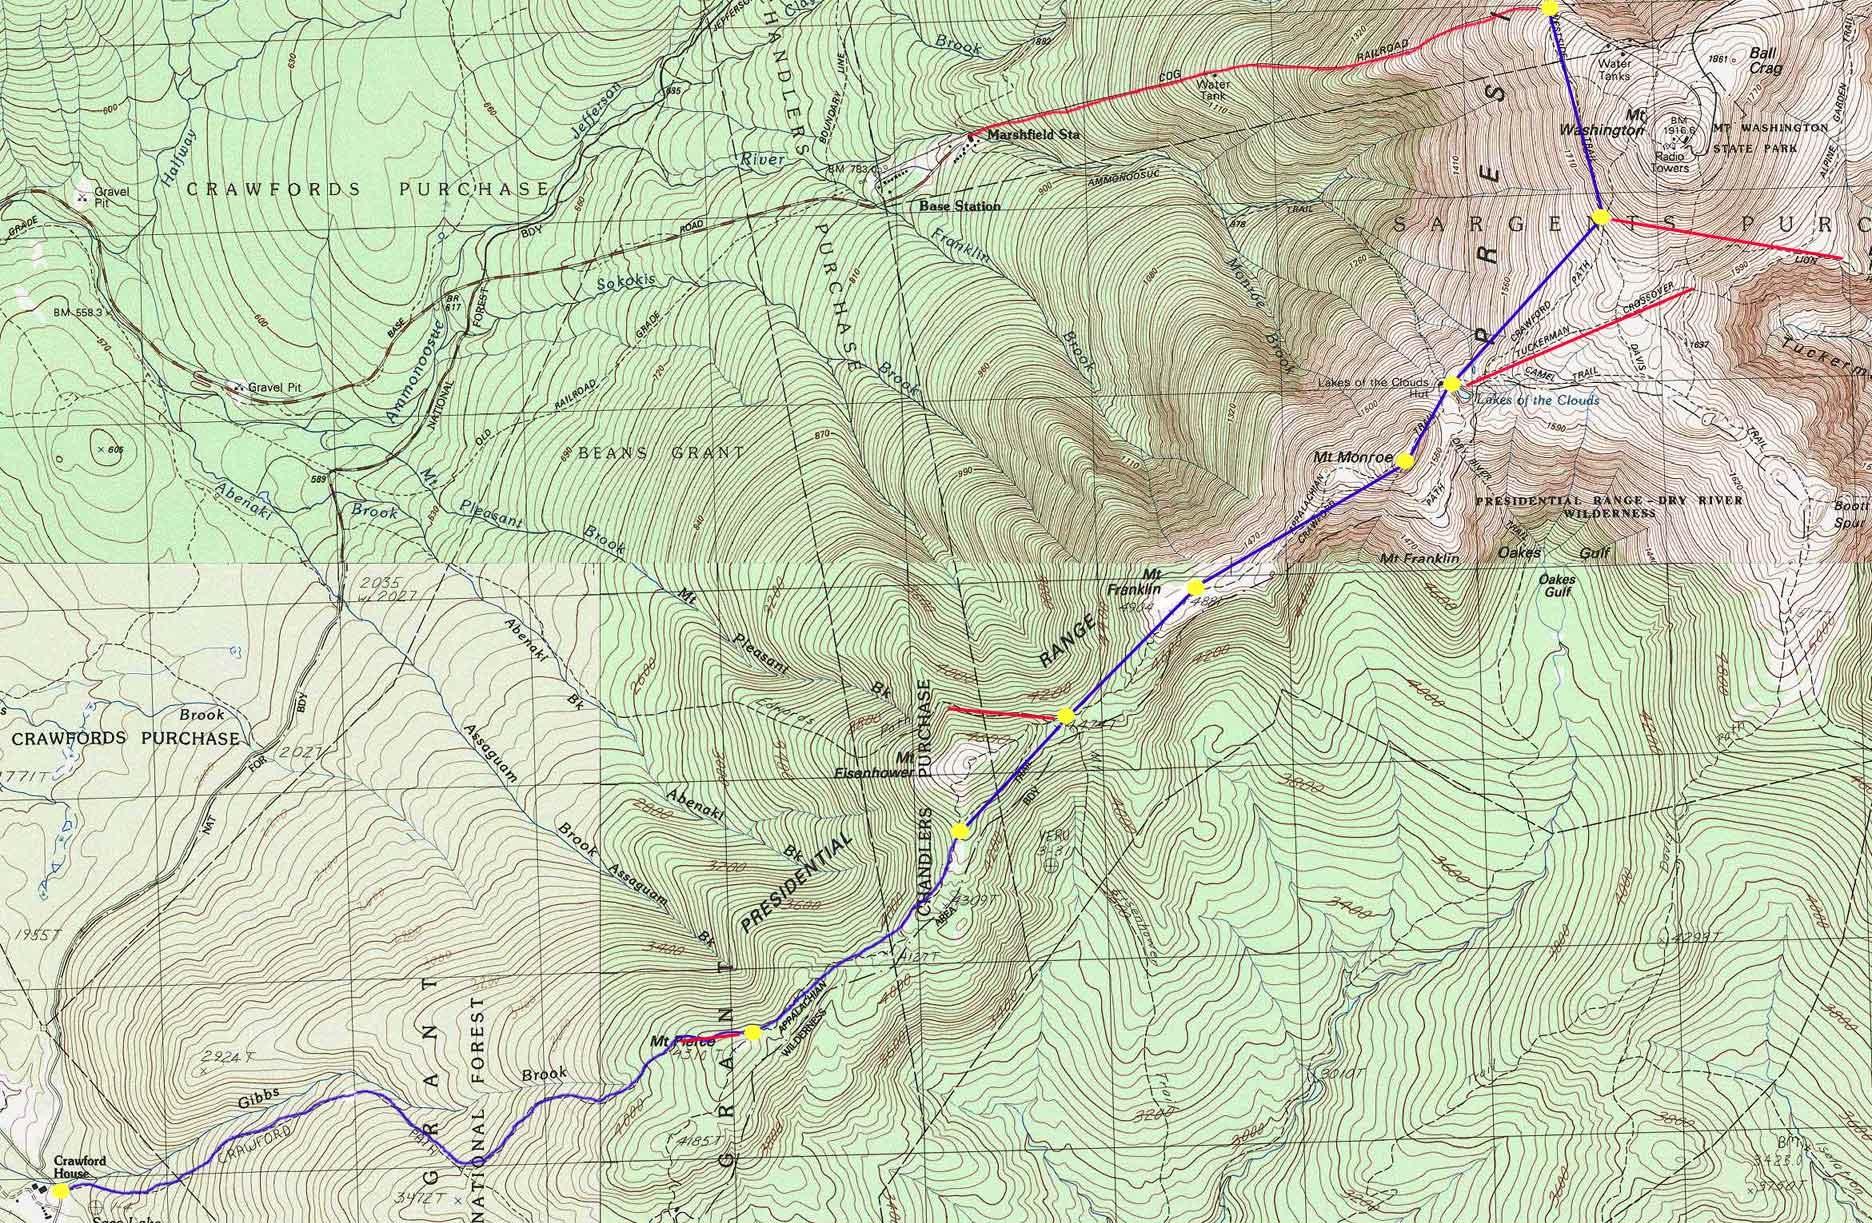 Presidential Traverse South Map.jpg